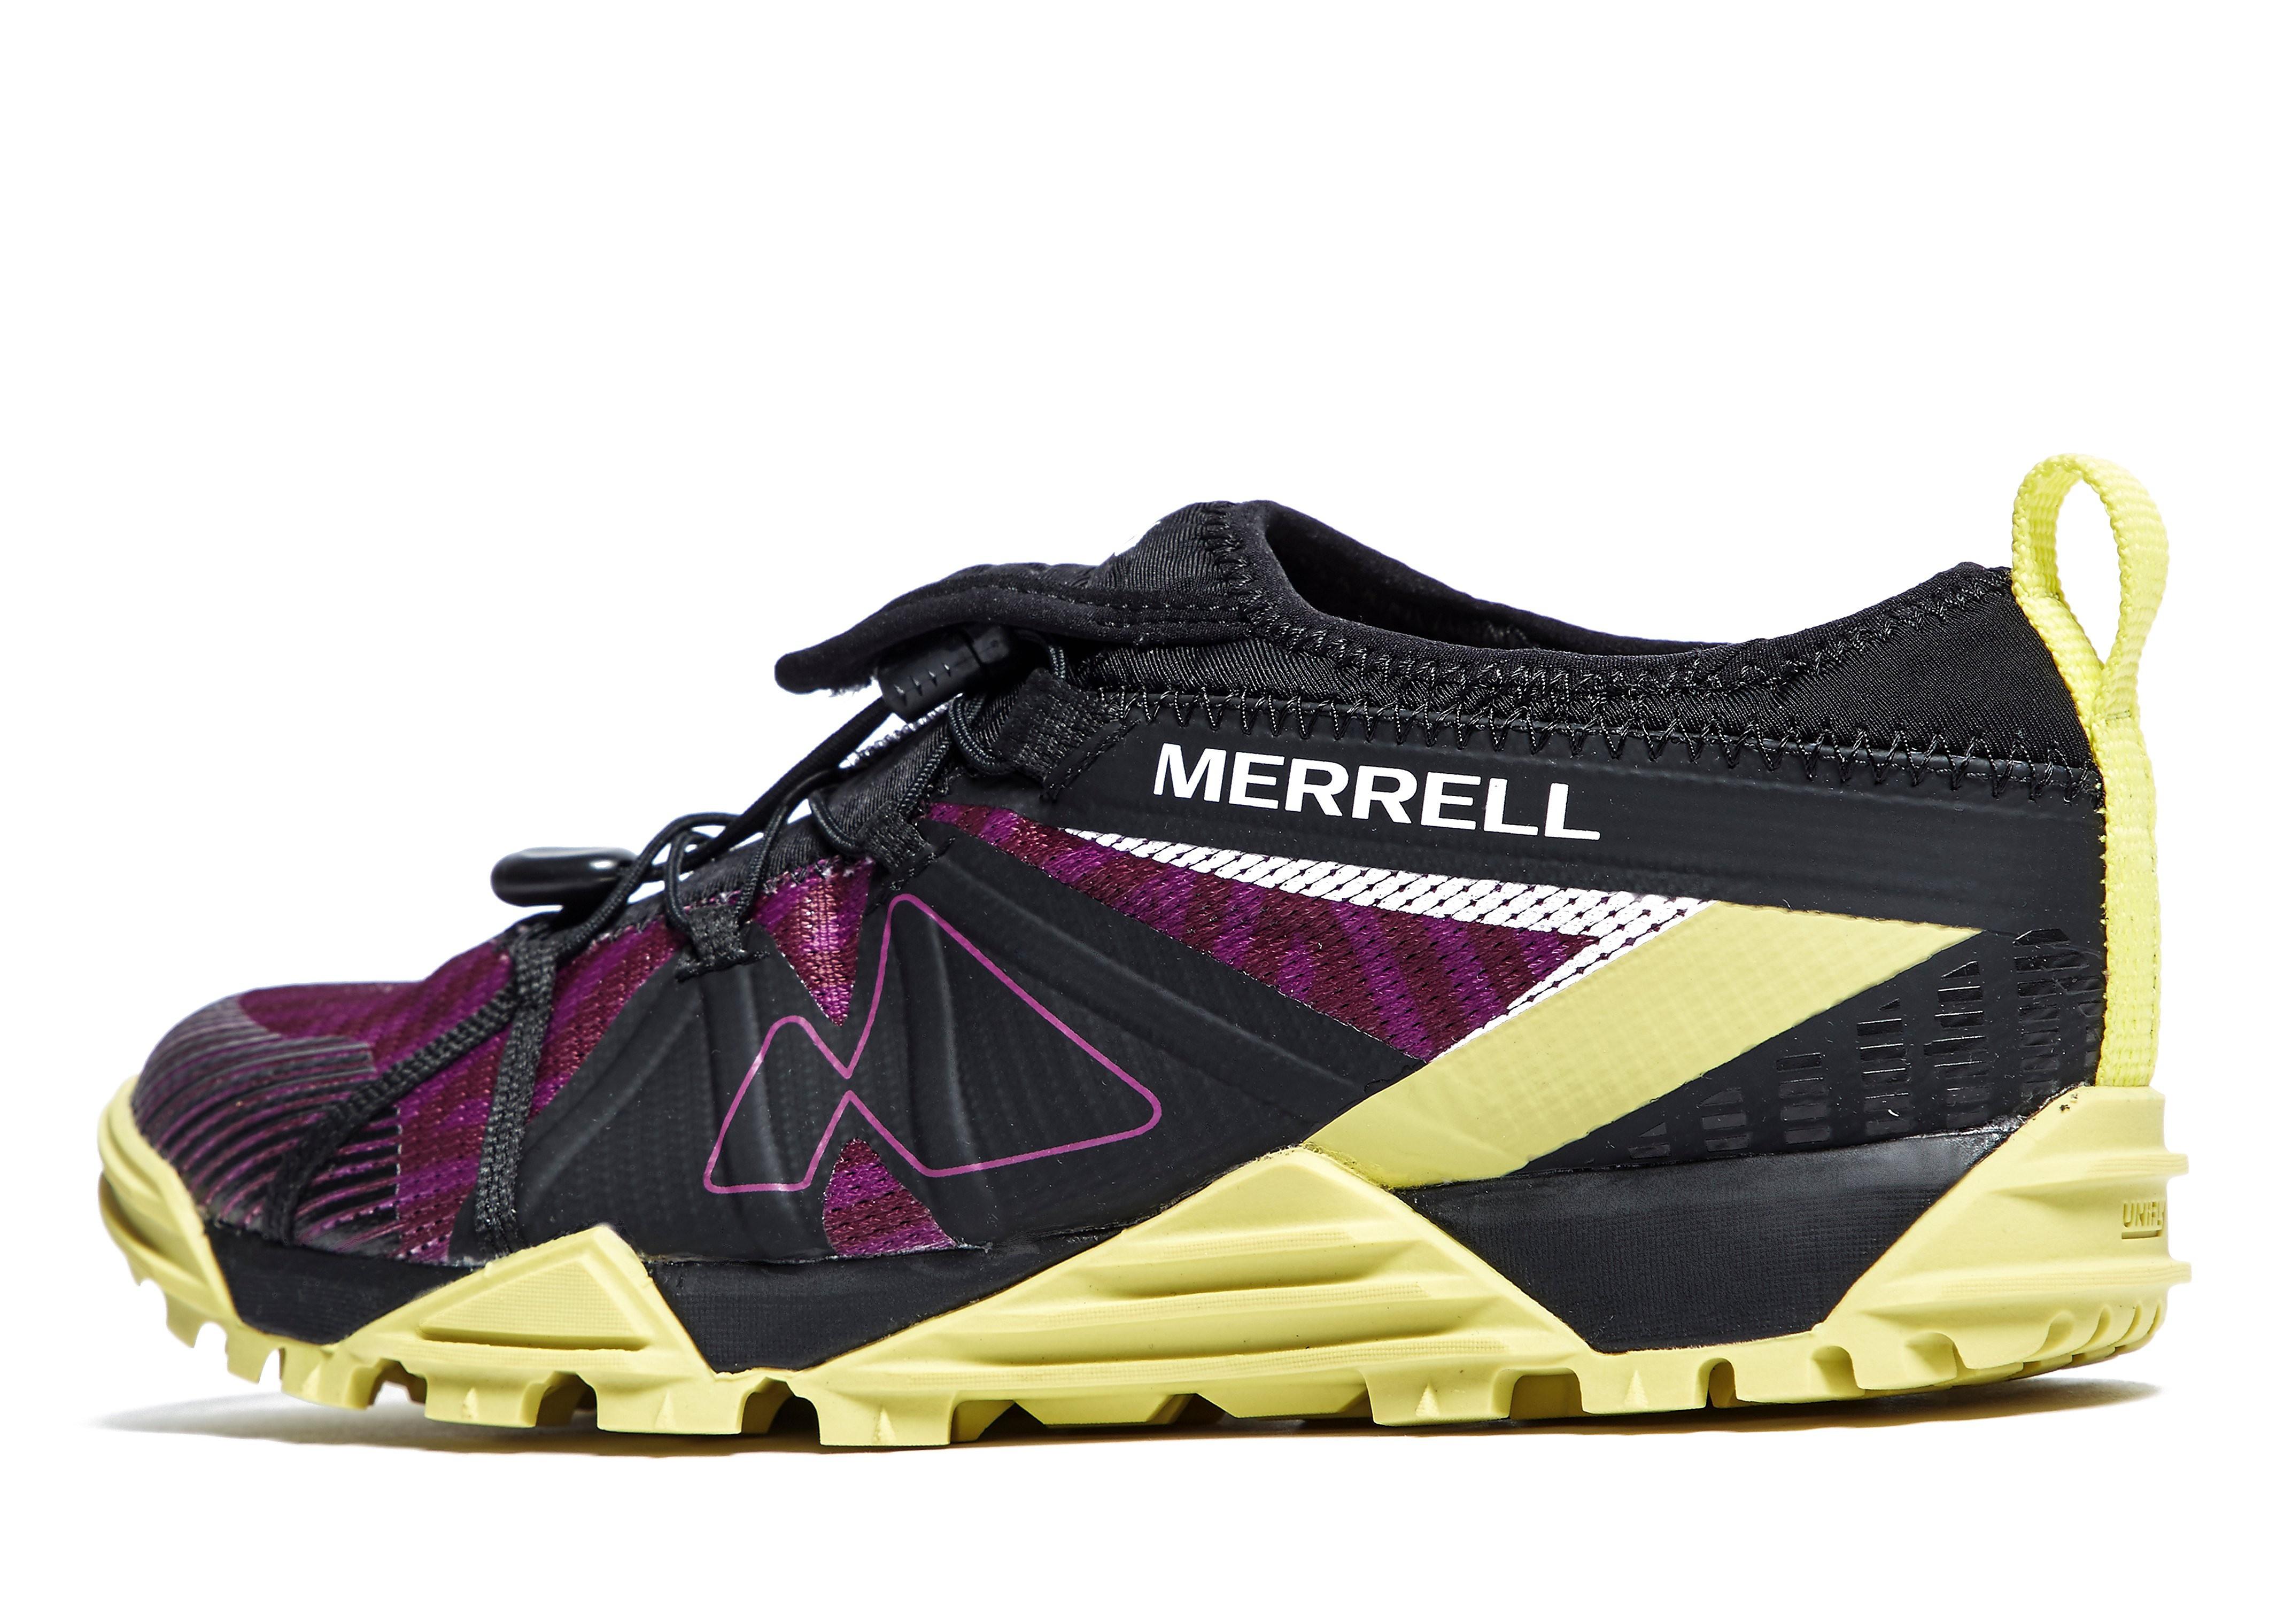 Merrell Avalaunch Women's